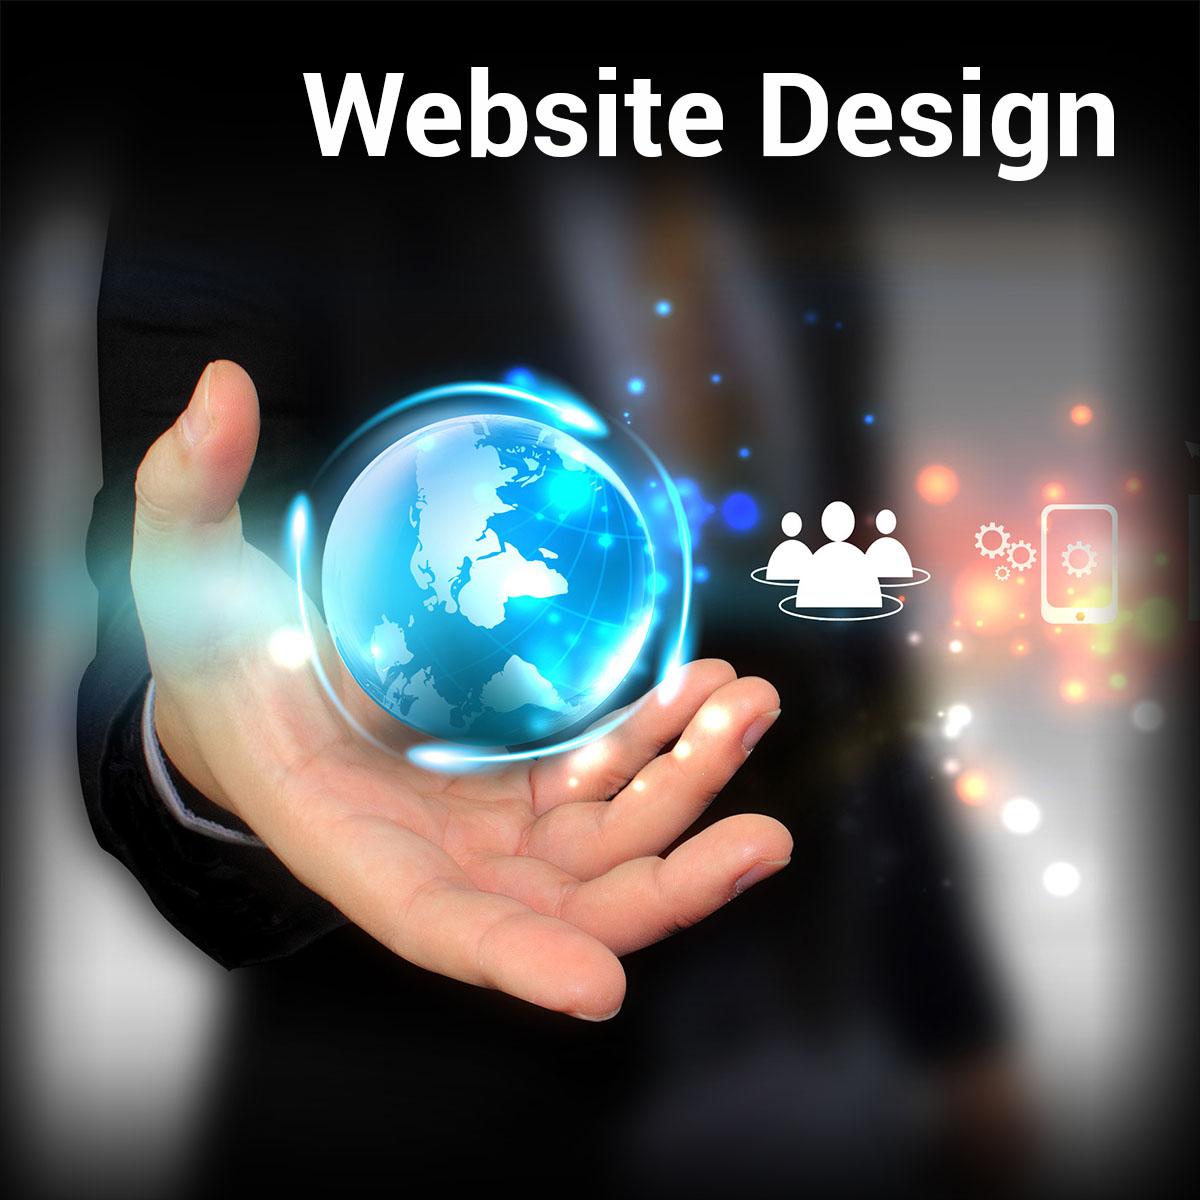 website design2